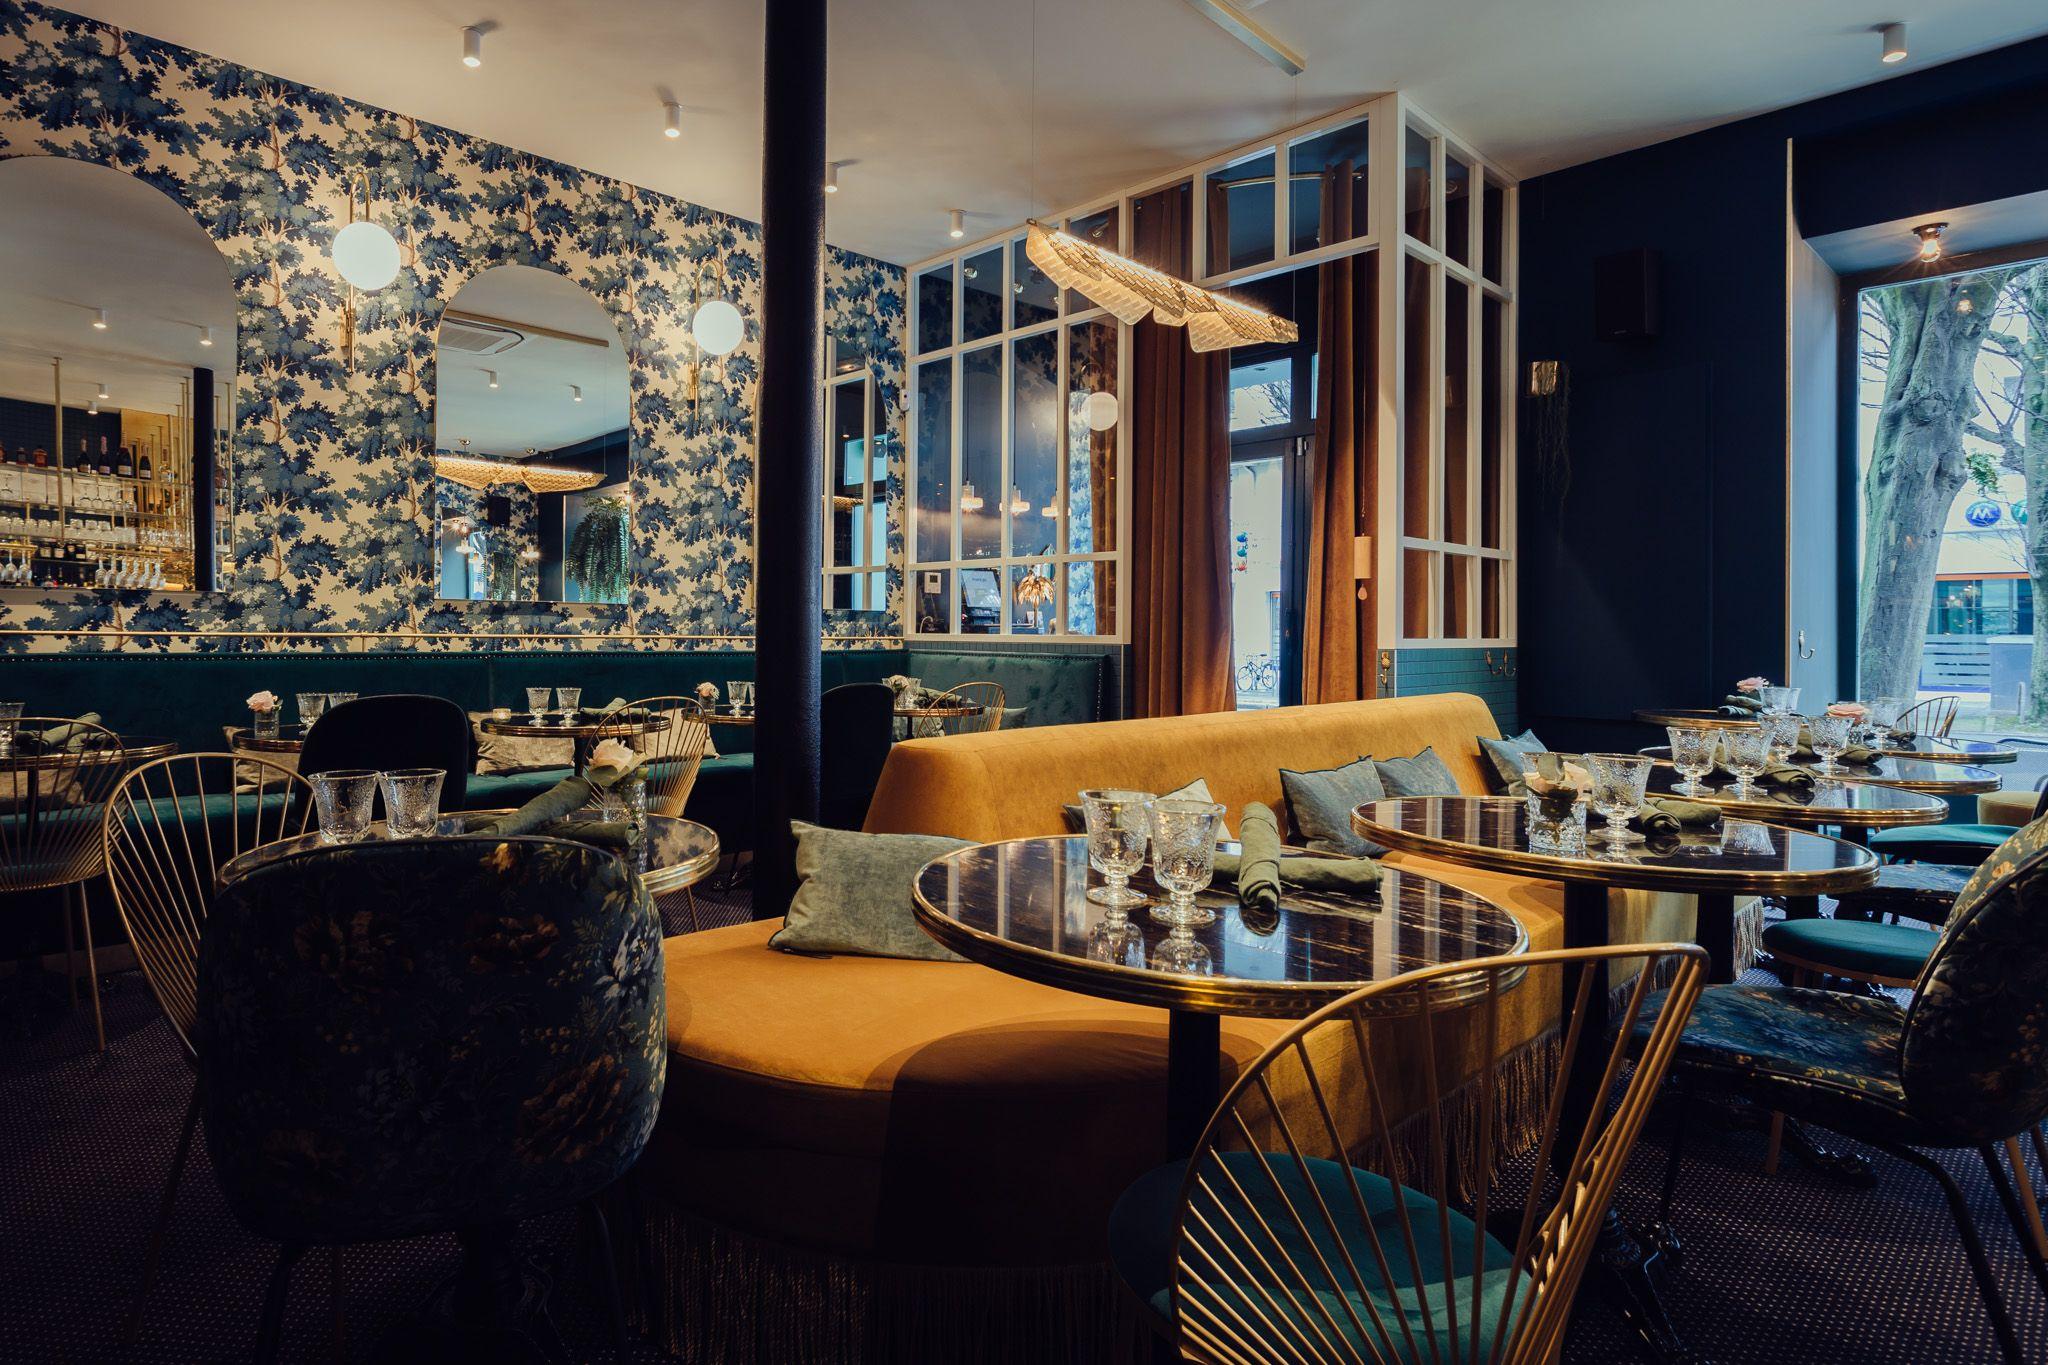 Wok Forever - Restaurant Asiatique, Rennes